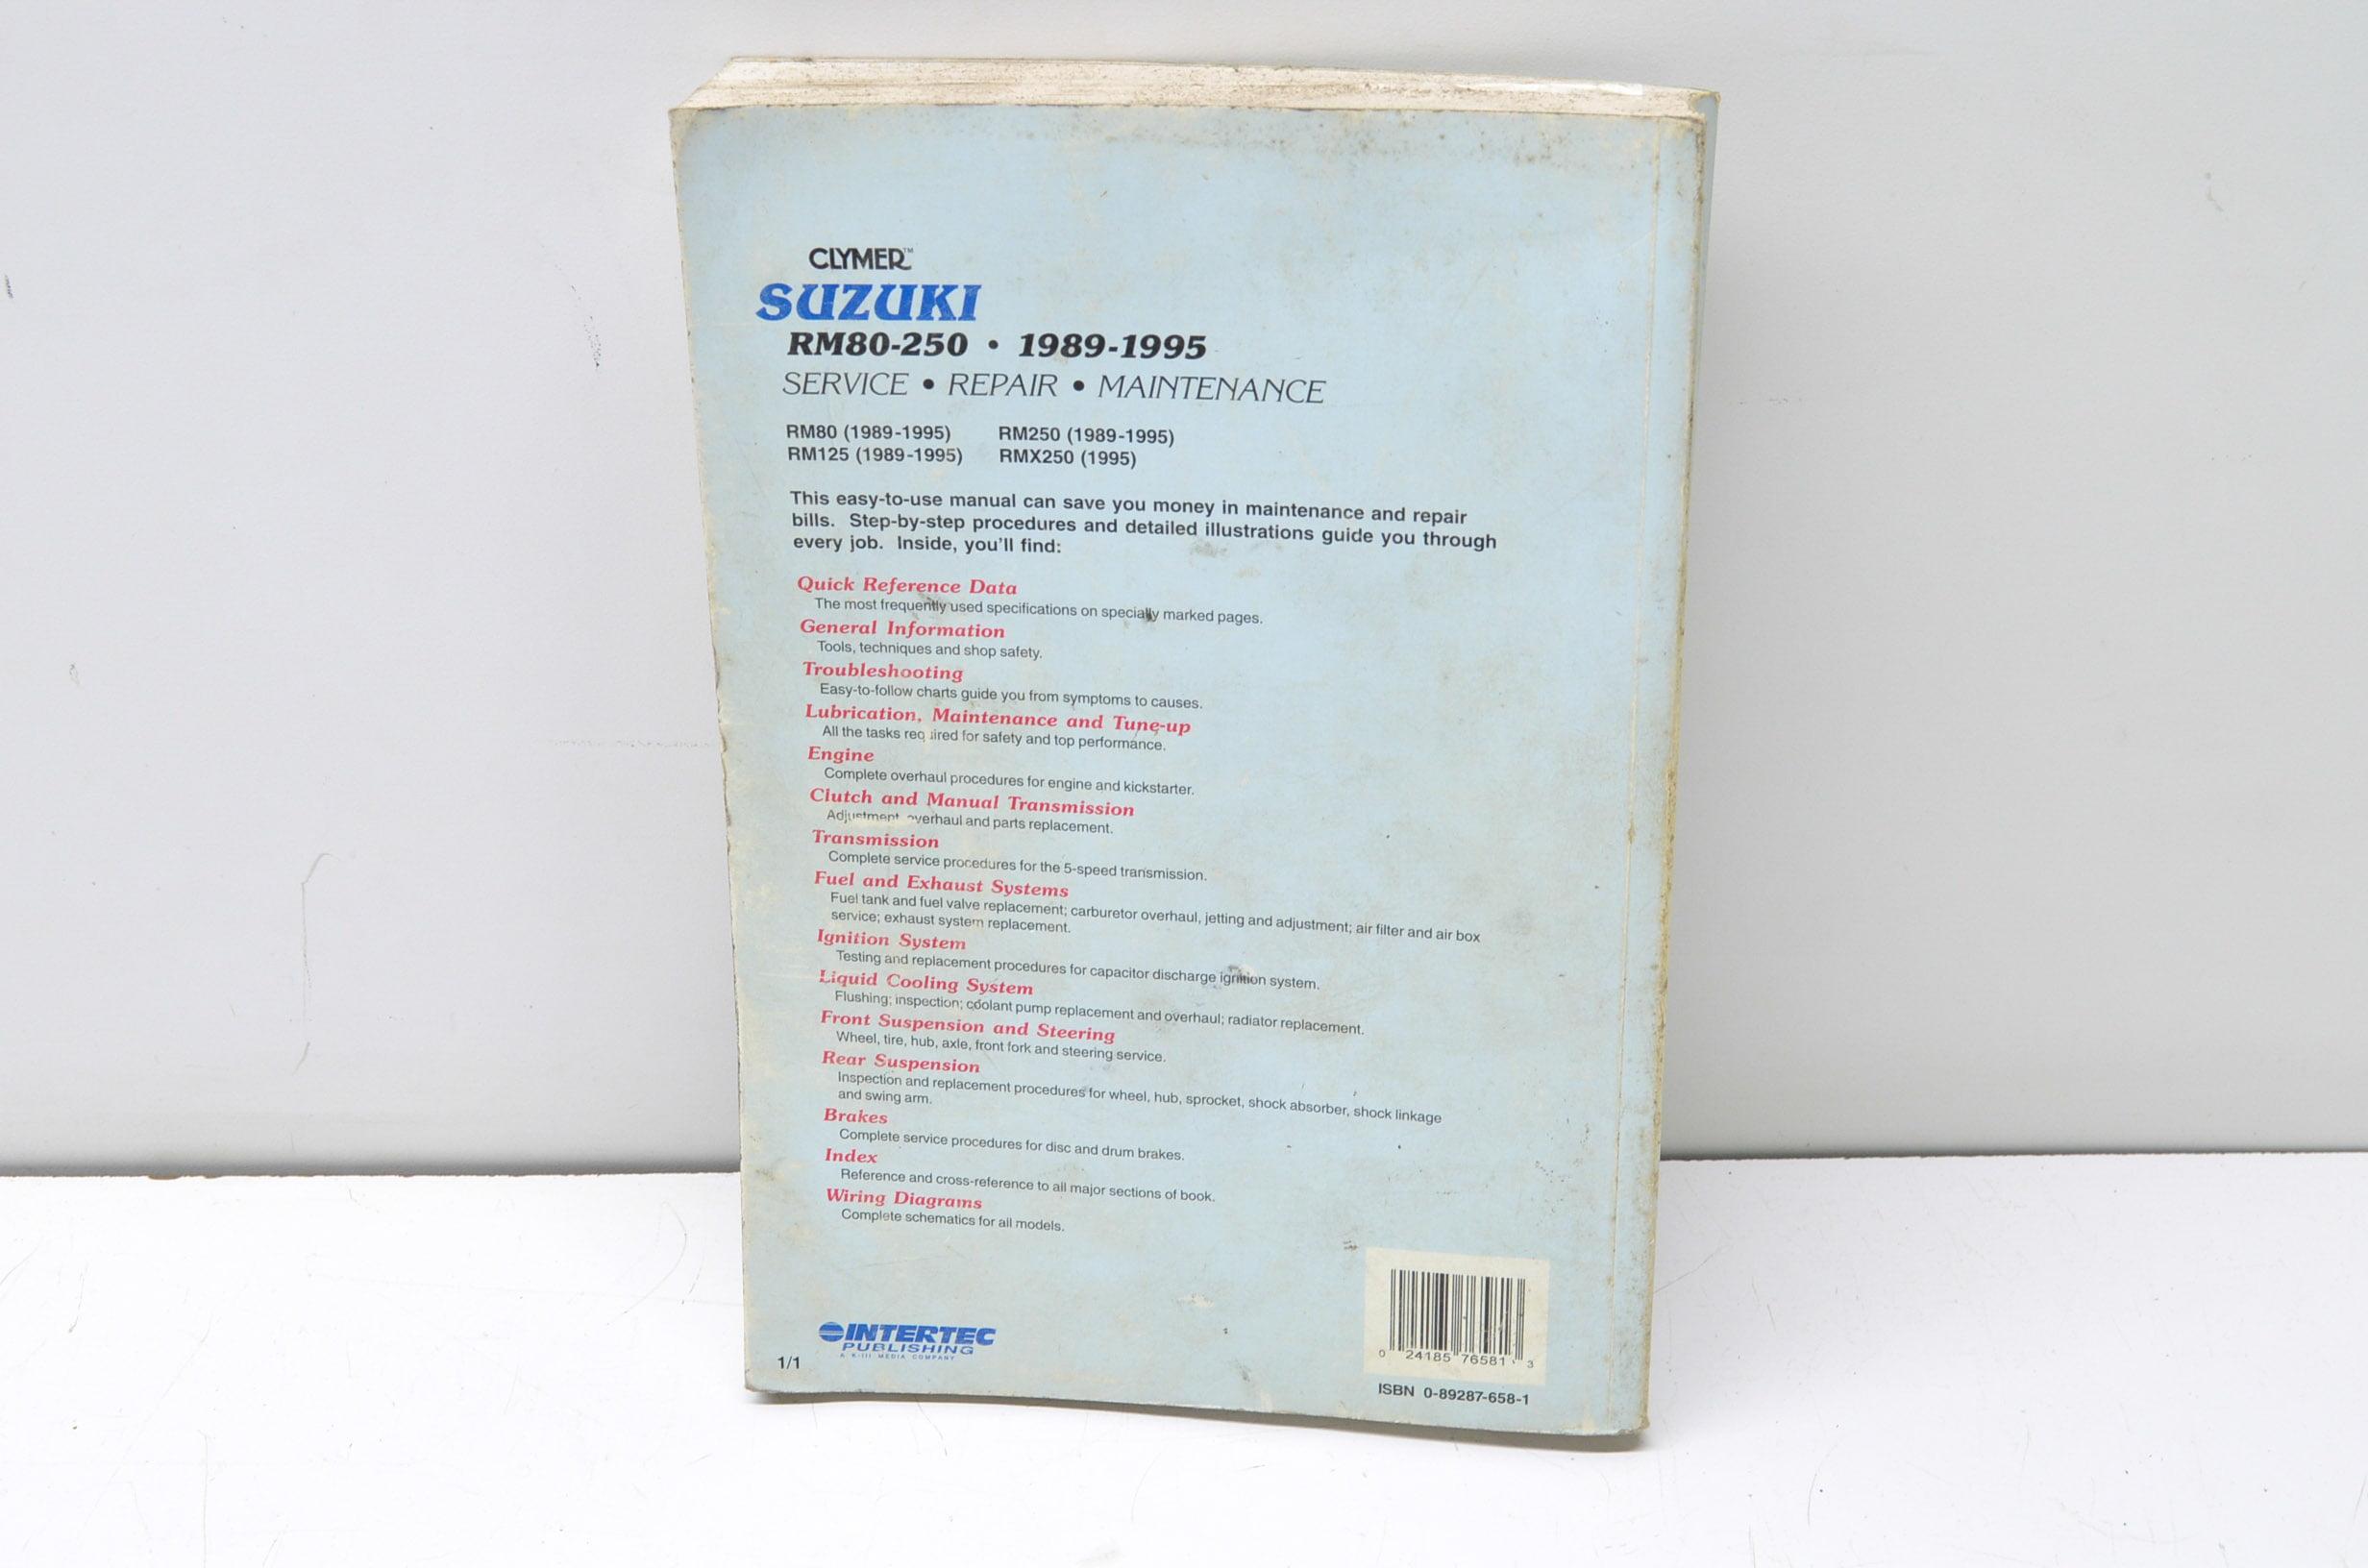 Clymer M386 1989-1995 Suzuki RM80 Service Repair Maintenance Manual QTY 1 -  Walmart.com